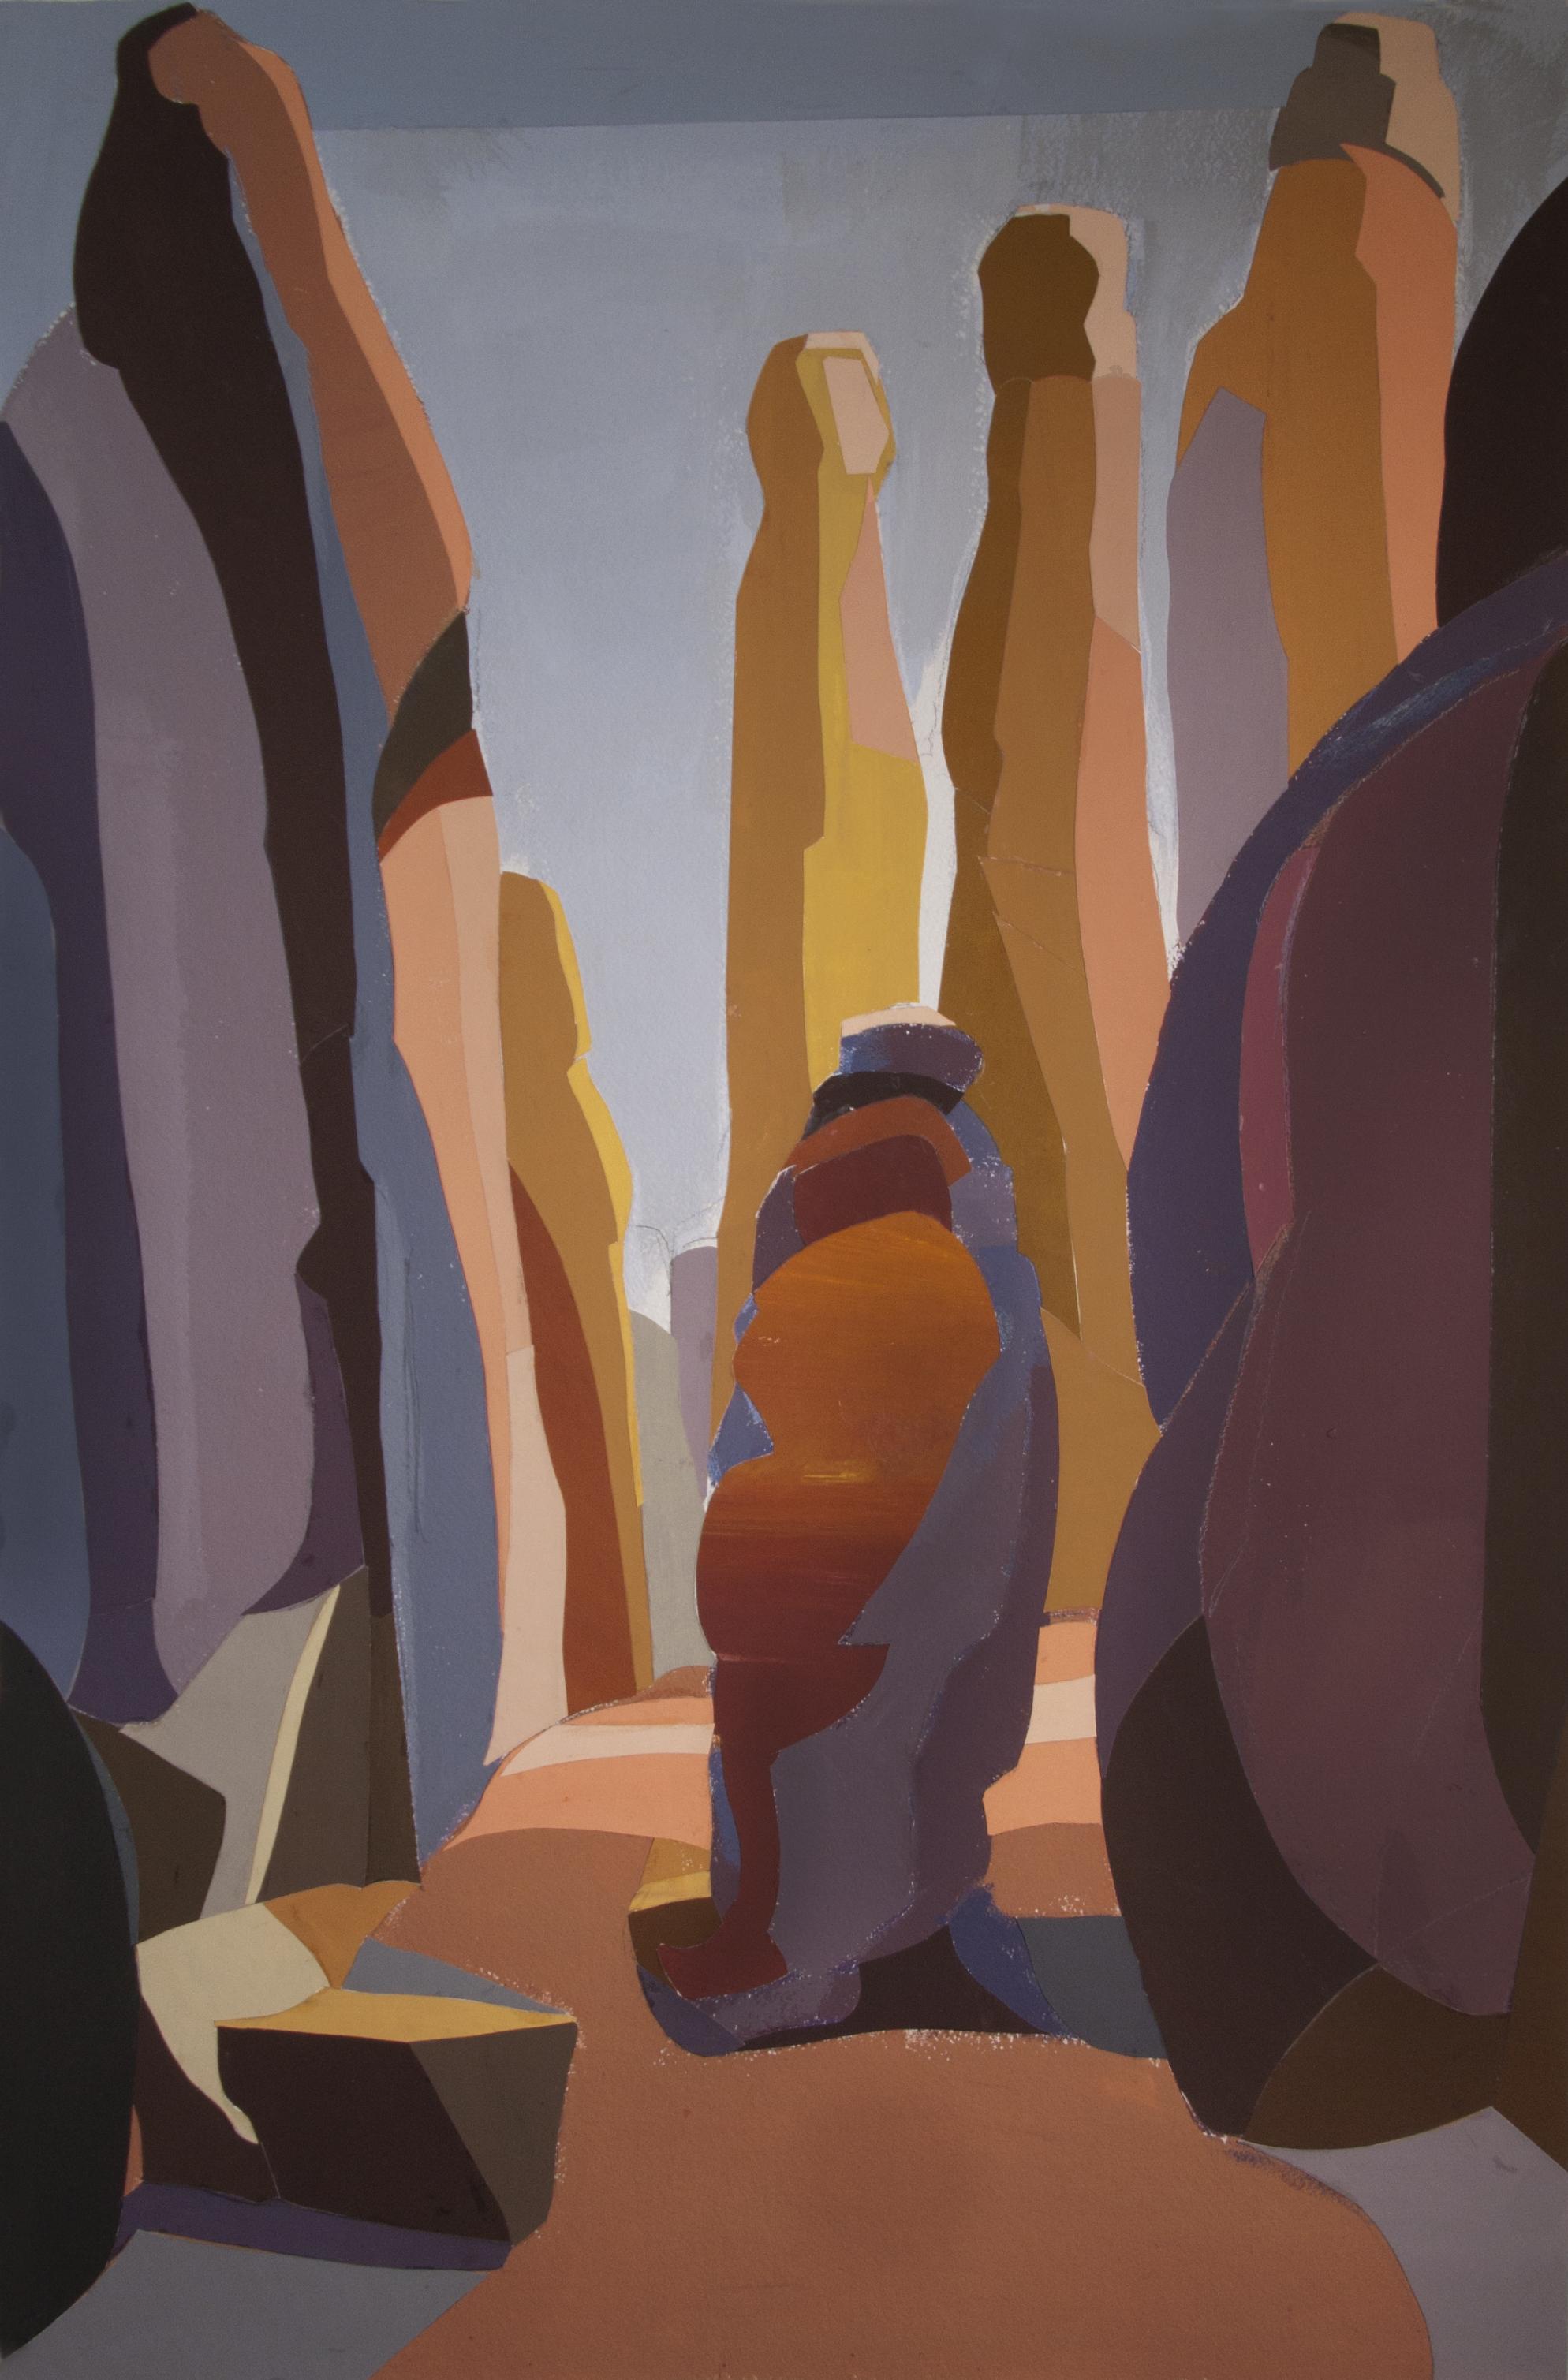 Tall Rocks Arches II,  cut paper, gouache, 36 x 24 in., 2018